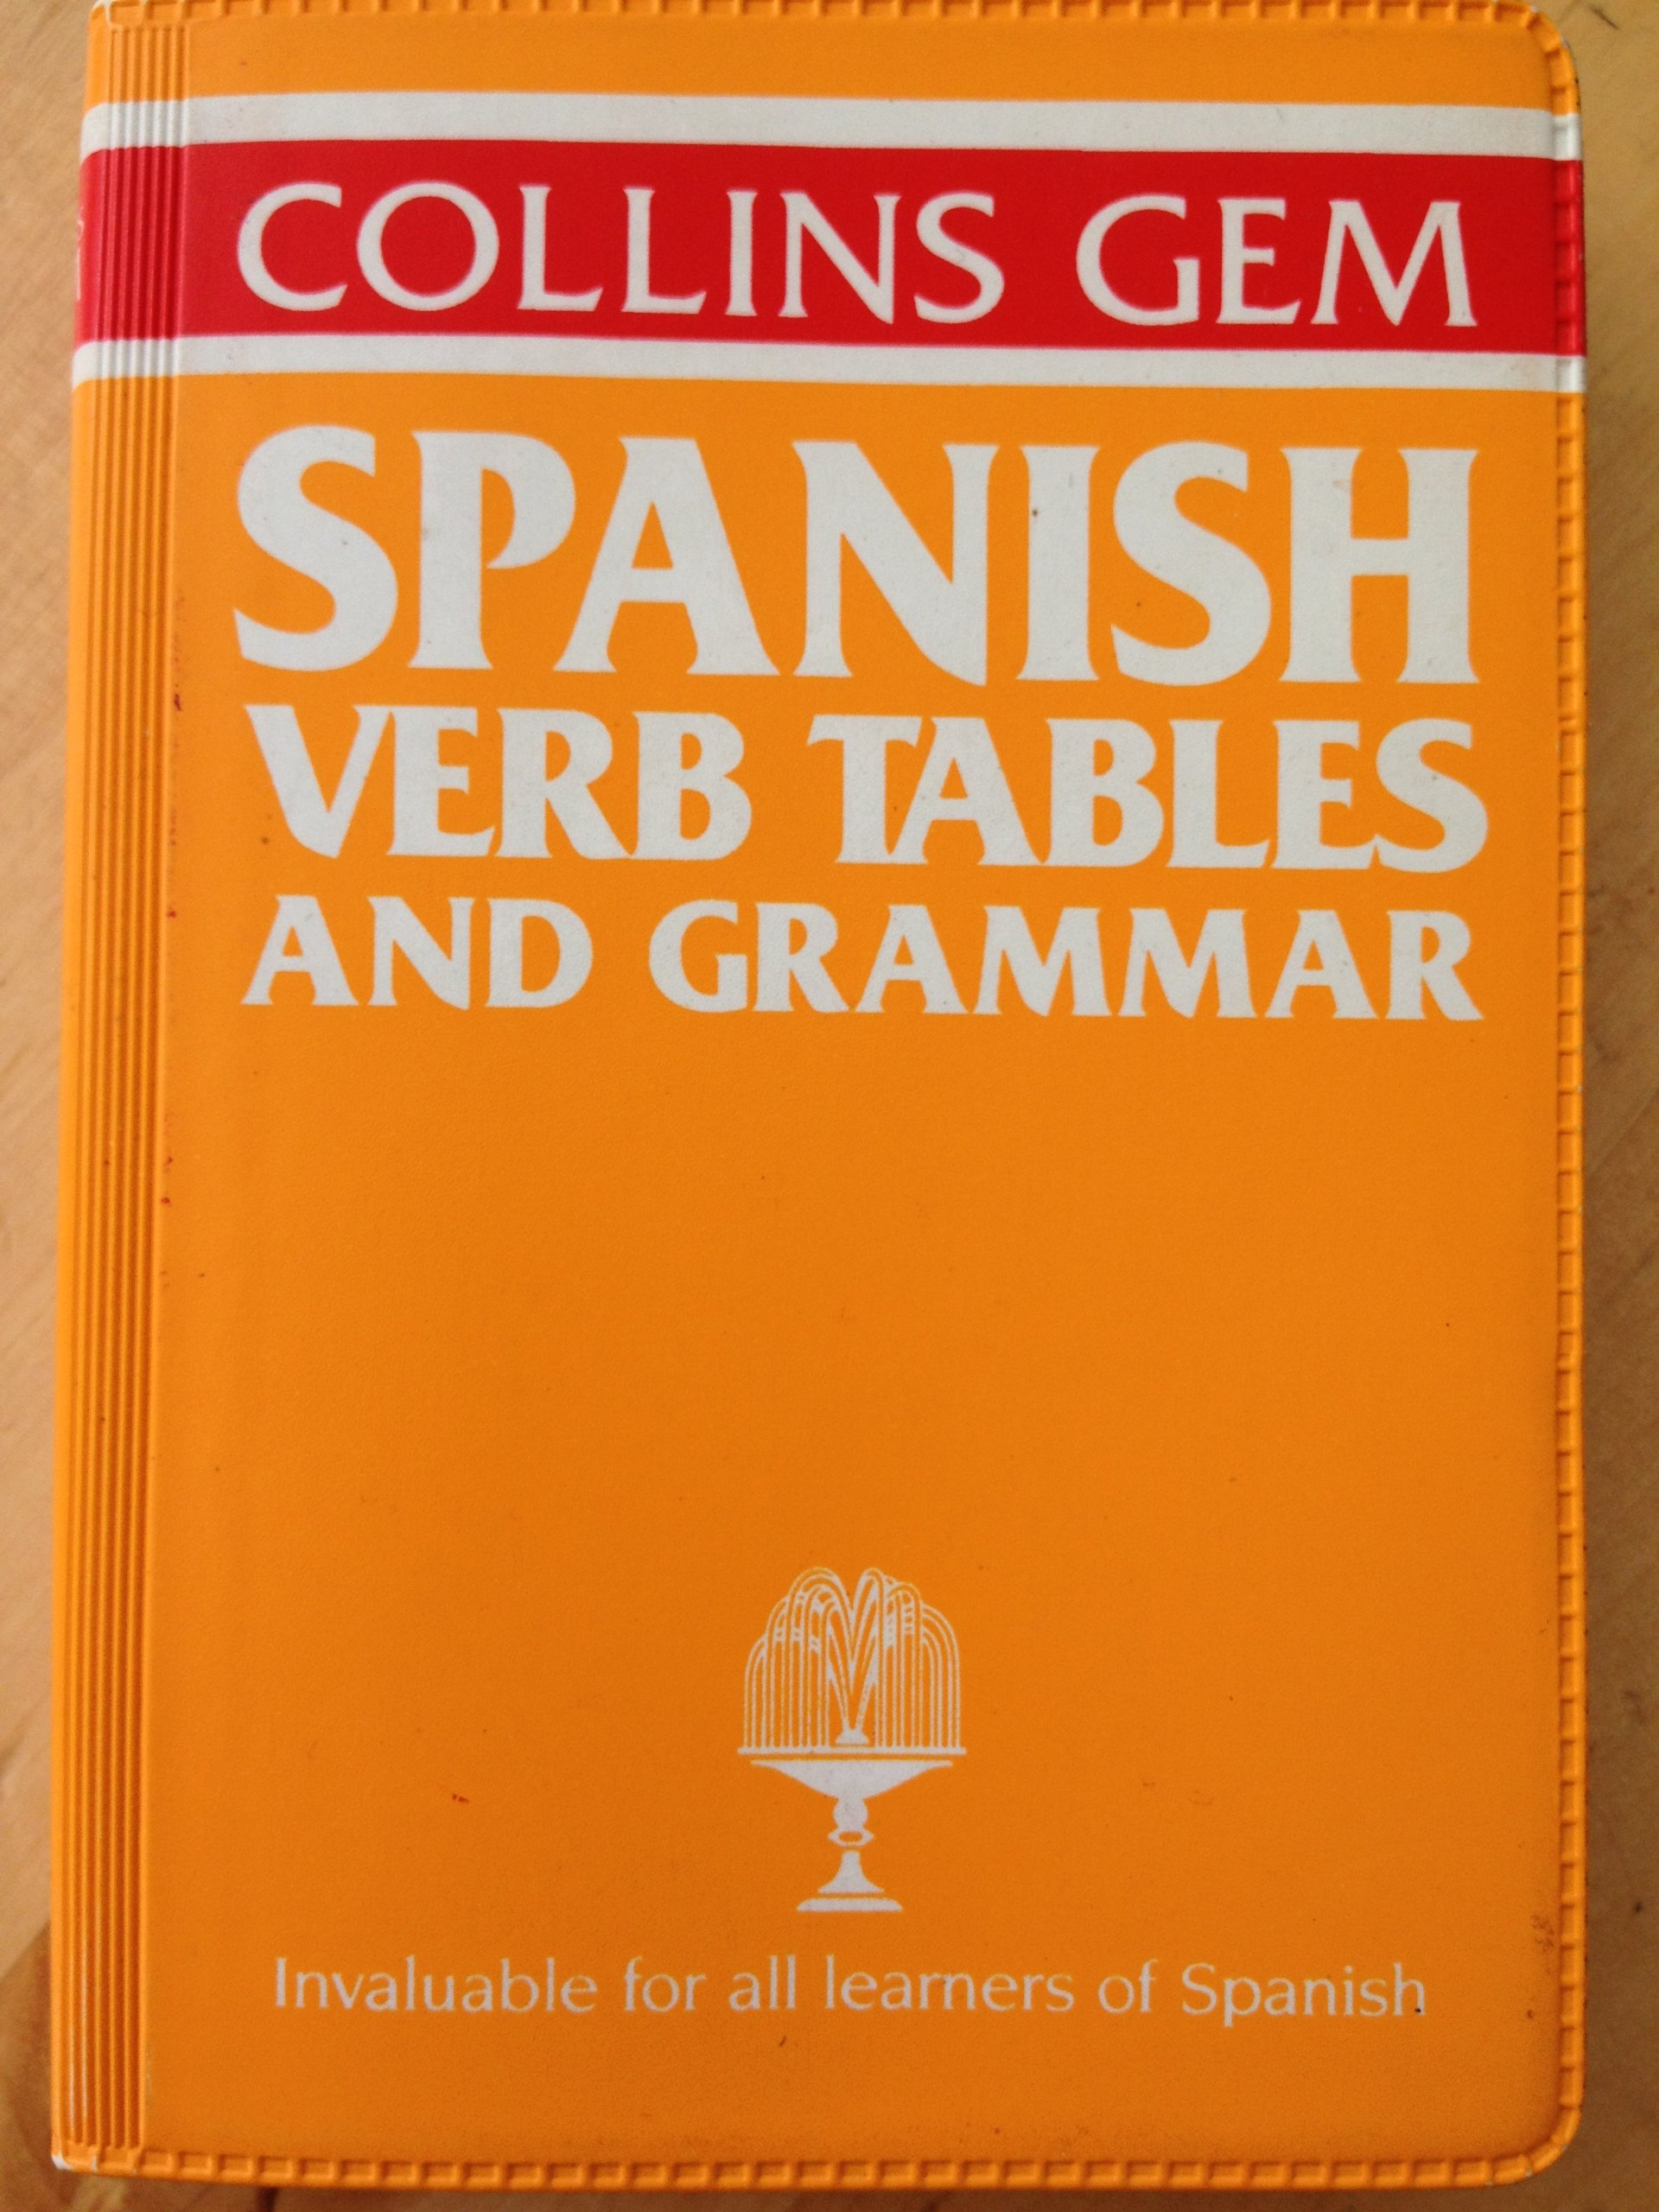 Collins Gem Spanish Verb Tables and Grammar (Gem Dictionaries): Alicia de  Benito de Harland, I.F. Ariza: 9780004593401: Amazon.com: Books